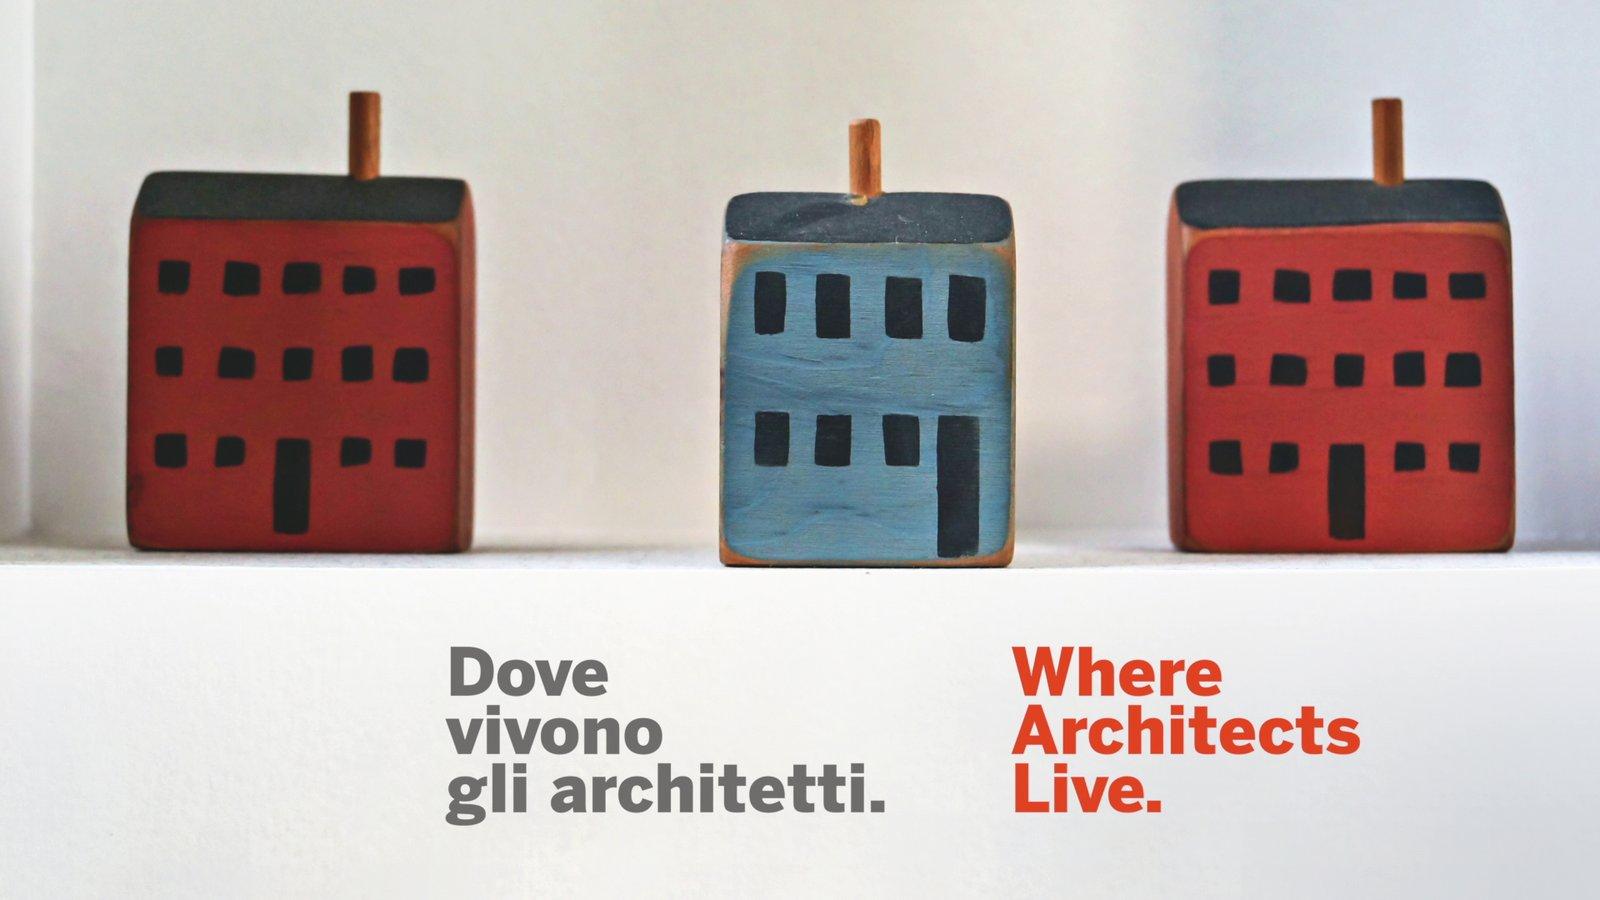 Where Architects Live - Dove Vivono Gli Architetti